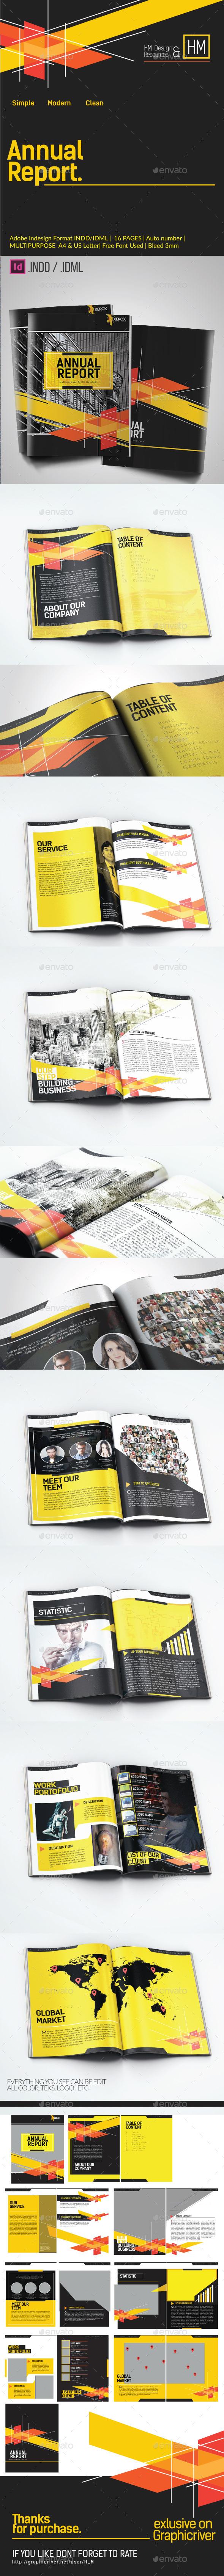 Annual Report Multipurpose Corporate Template  - Corporate Brochures